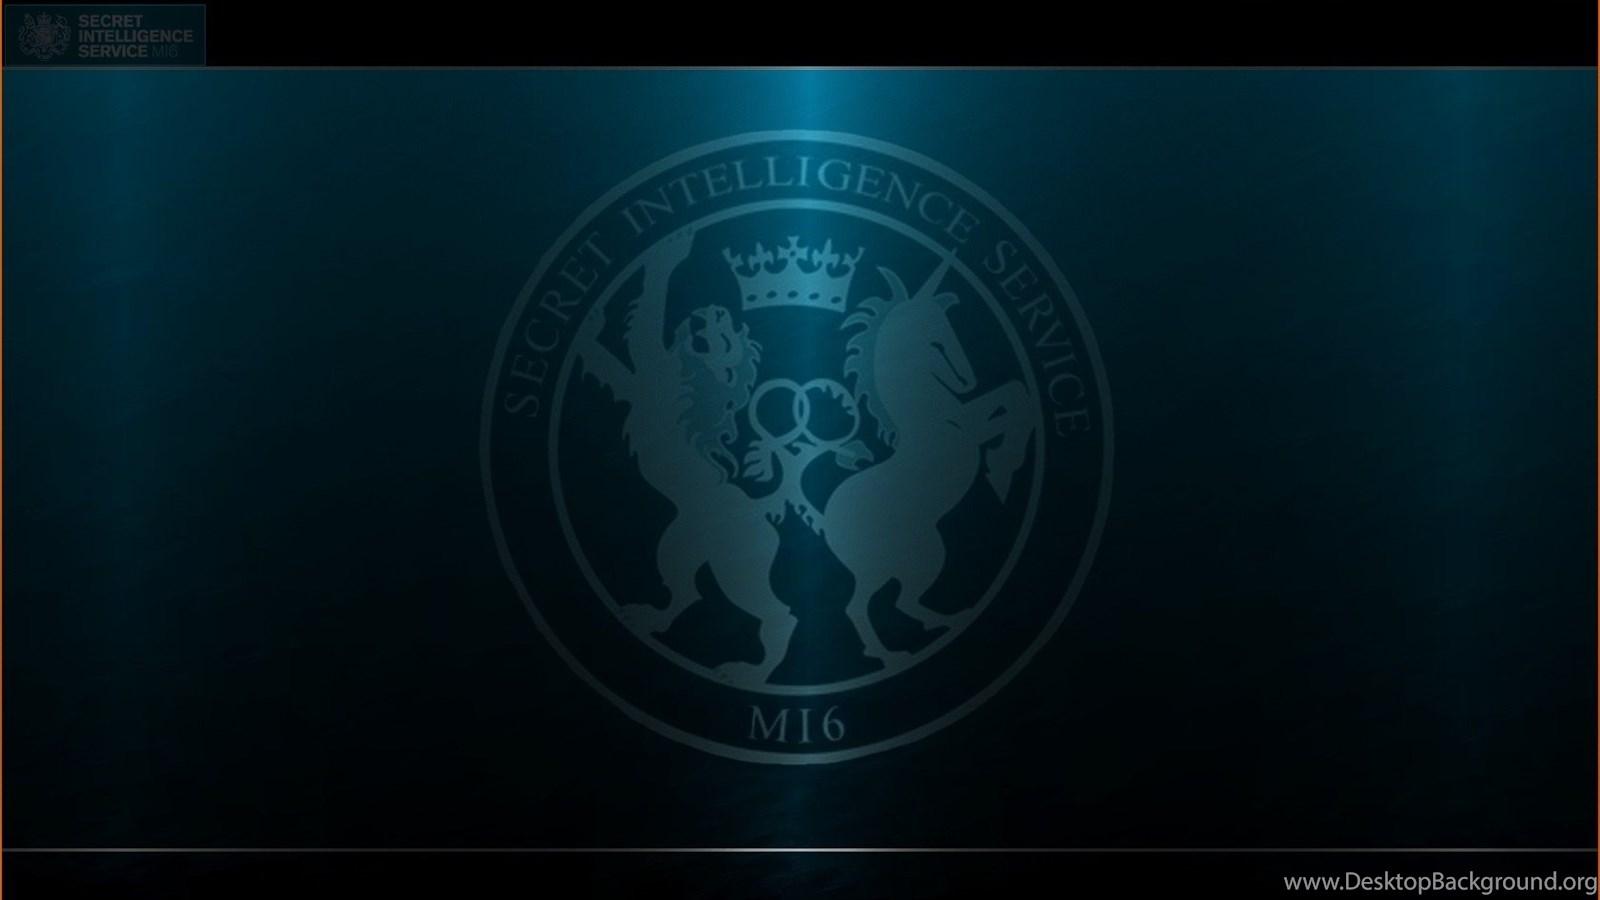 Download The MI6 Wallpaper, MI6 iPhone Wallpaper, MI6